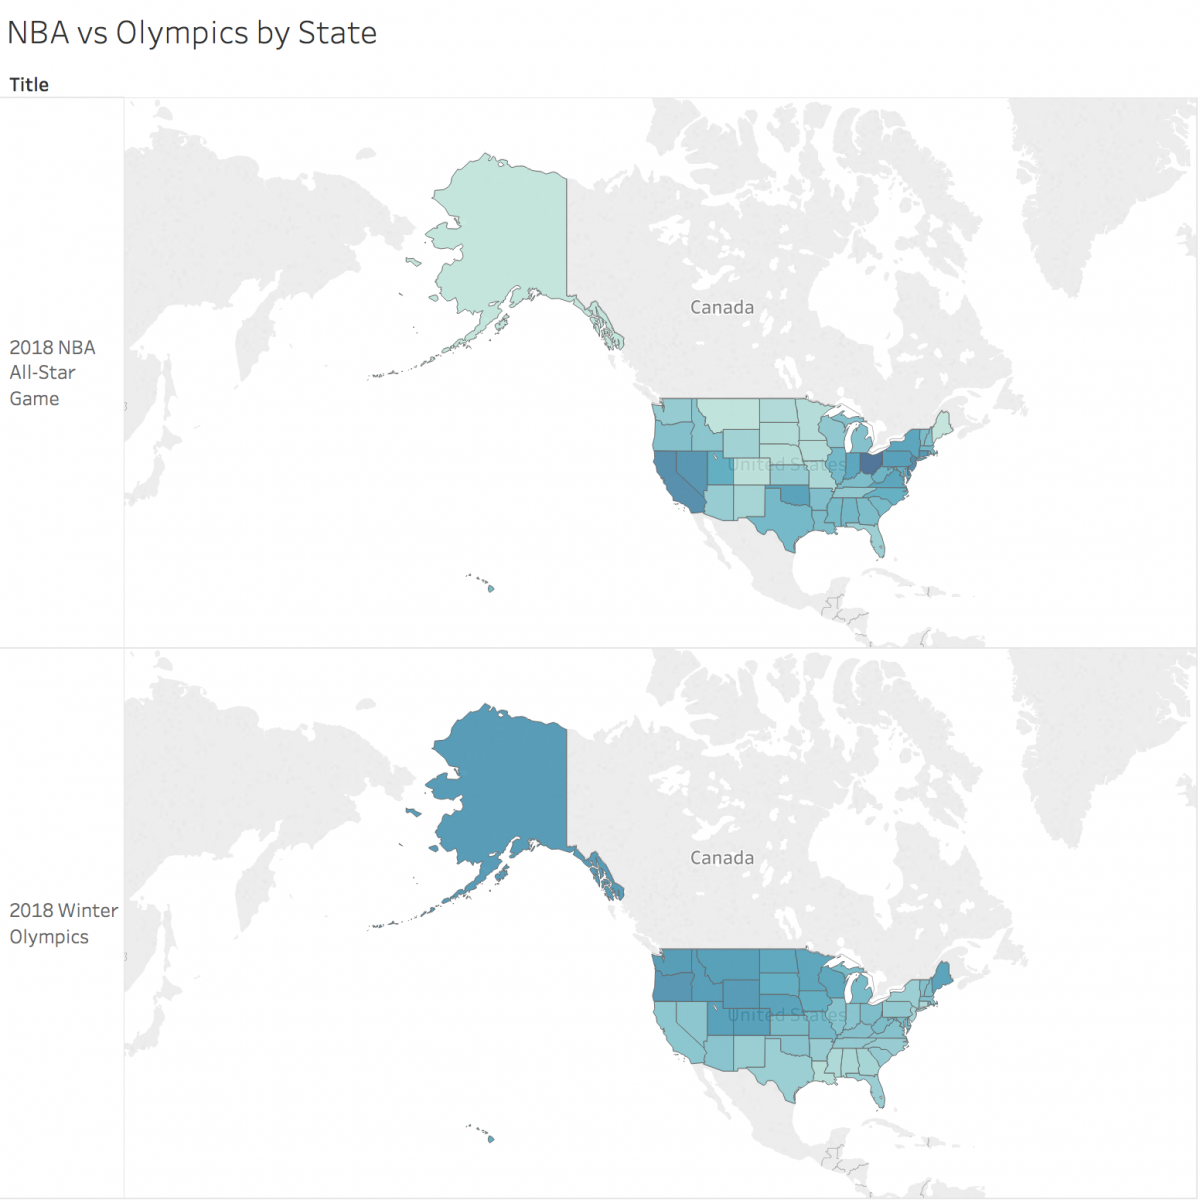 NBA v. Olympics viewership by state